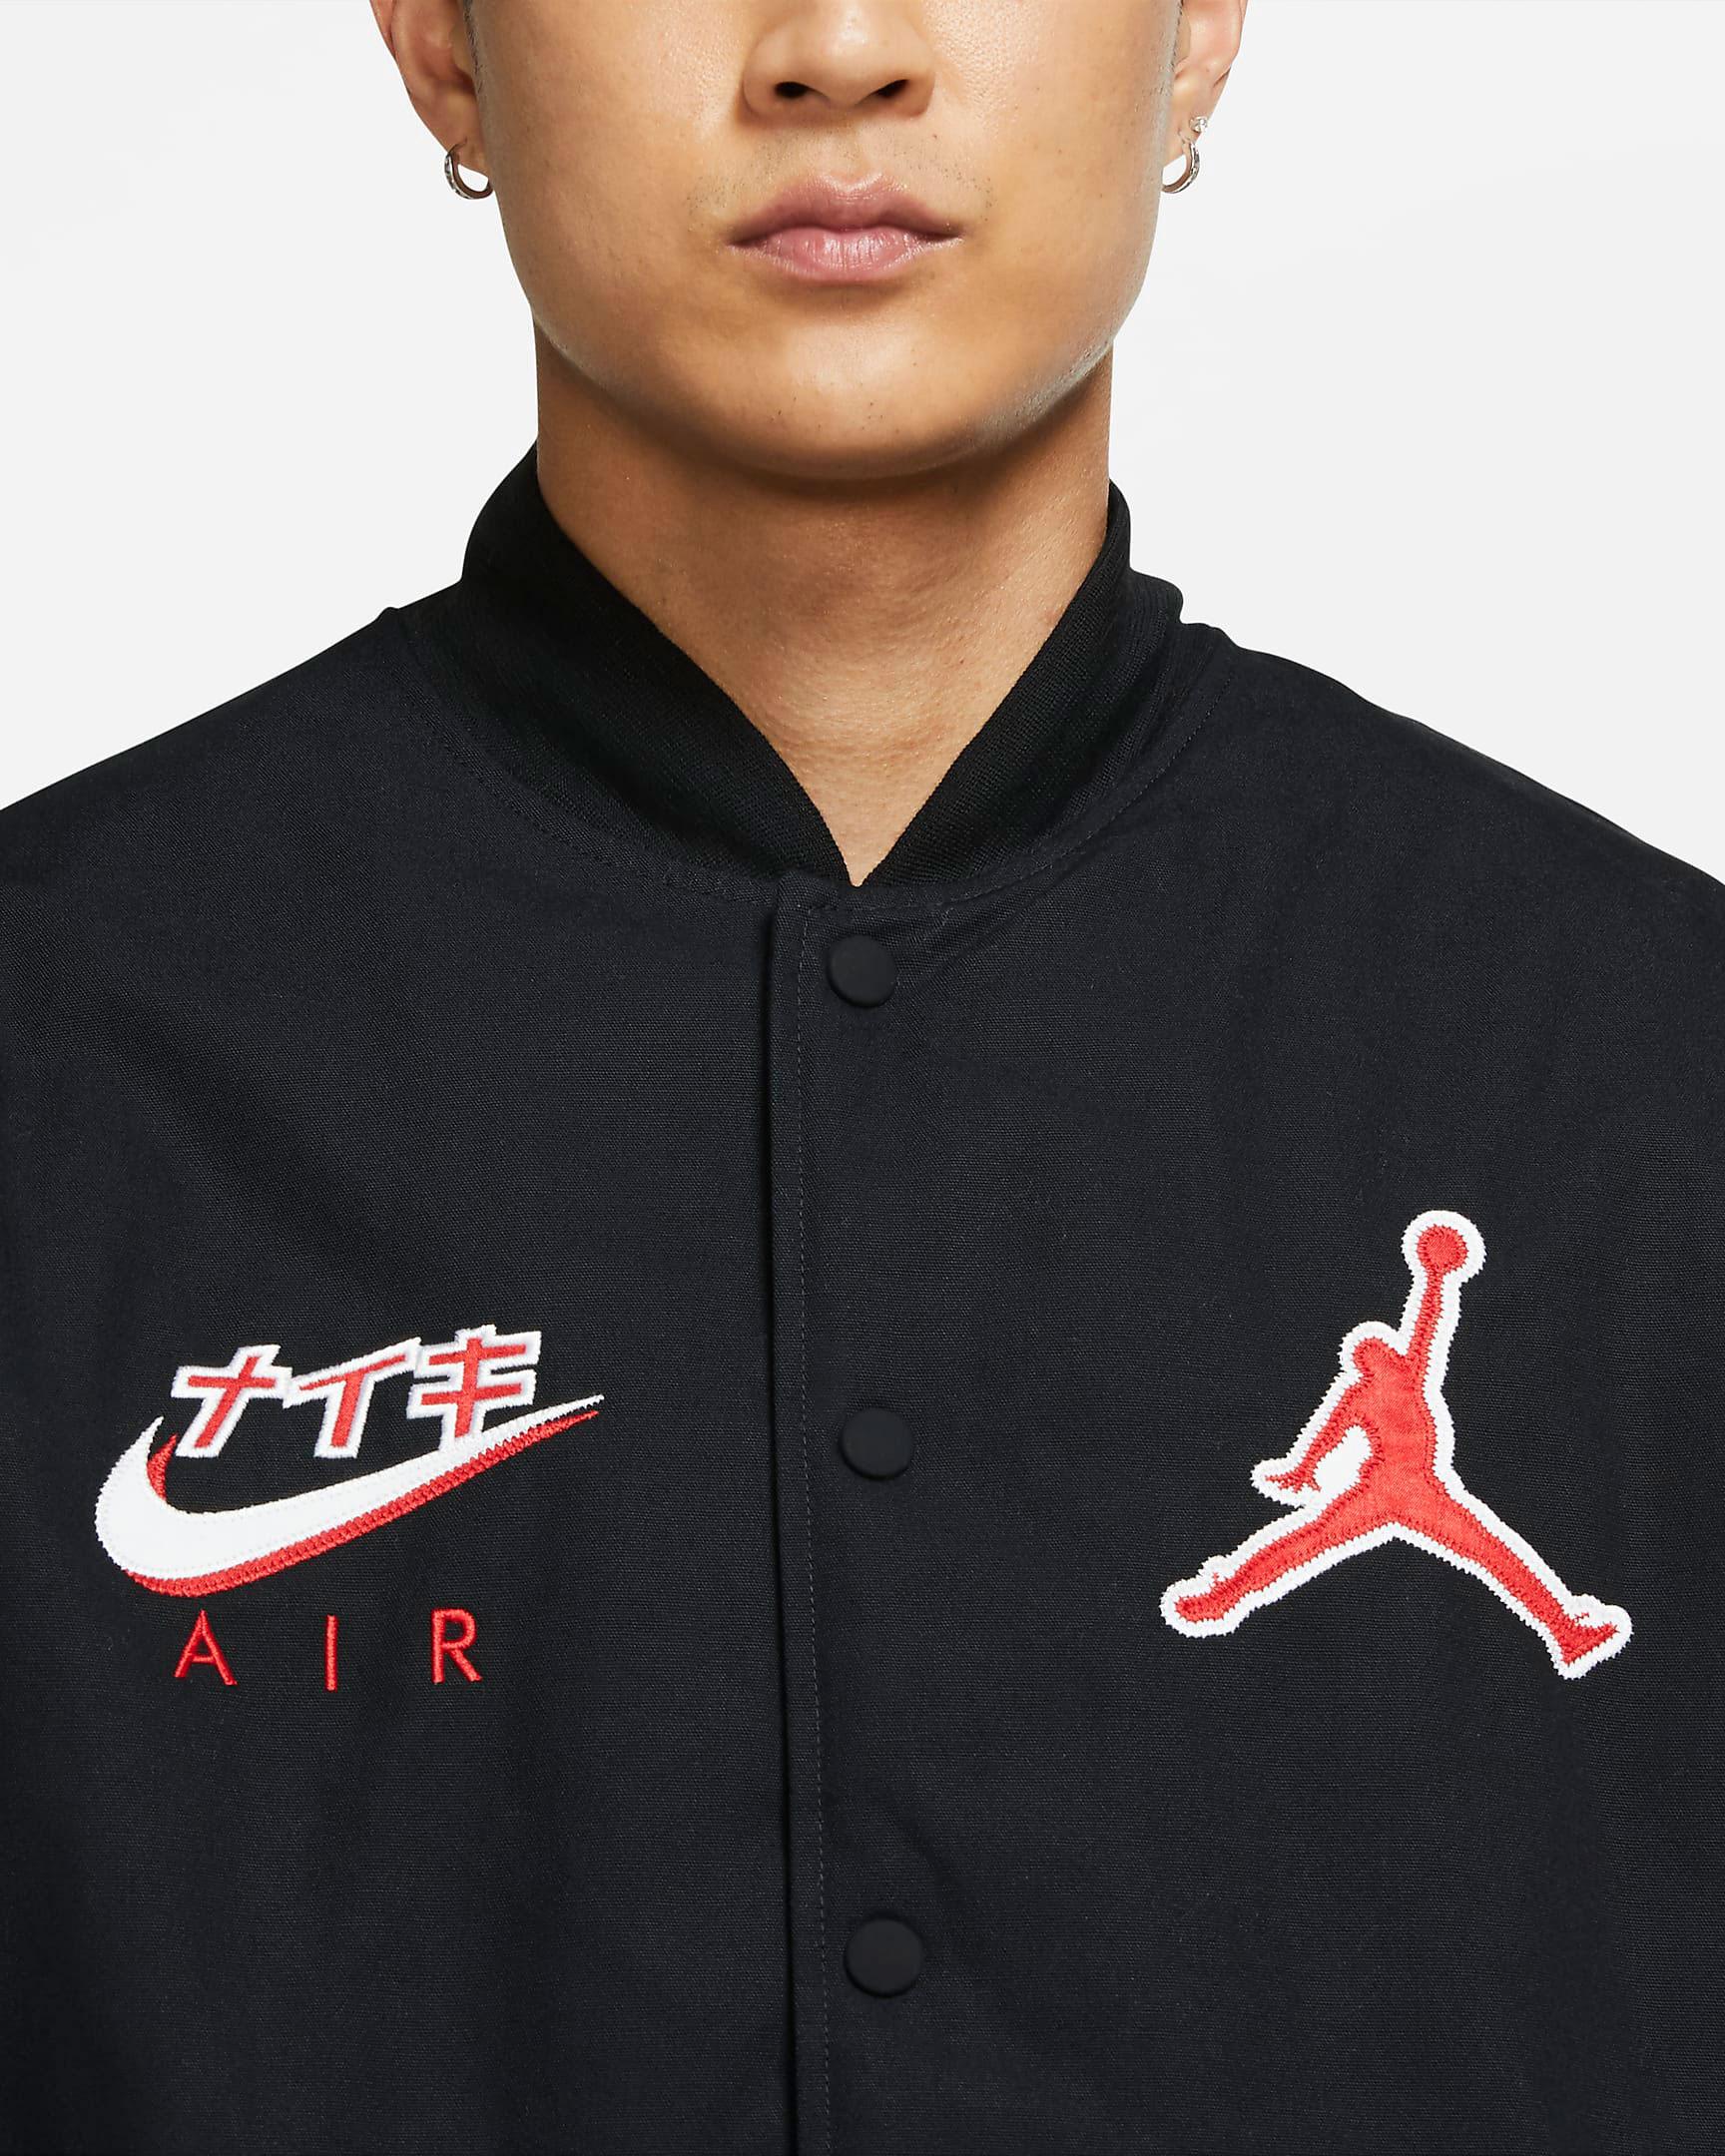 air-jordan-3-denim-fire-red-japan-jacket-3